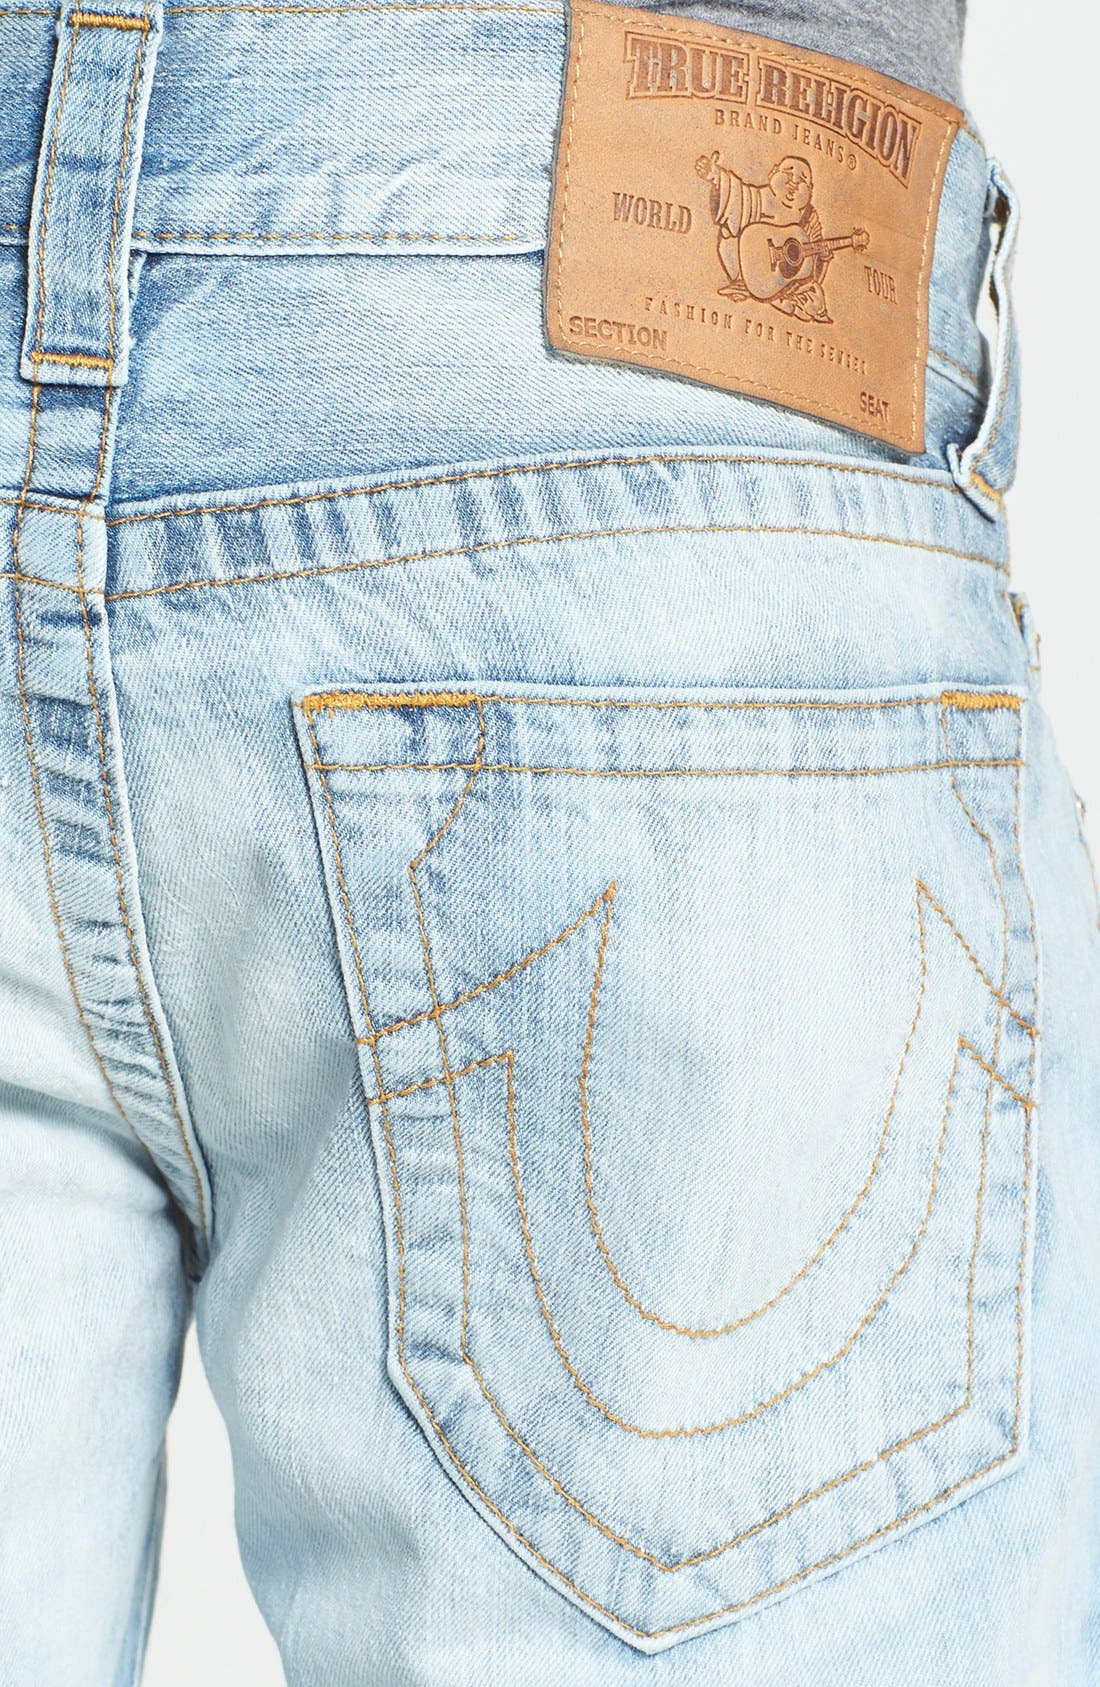 Alternate Image 4  - True Religion Brand Jeans 'Geno' Straight Leg Jeans (YLL Antelope)